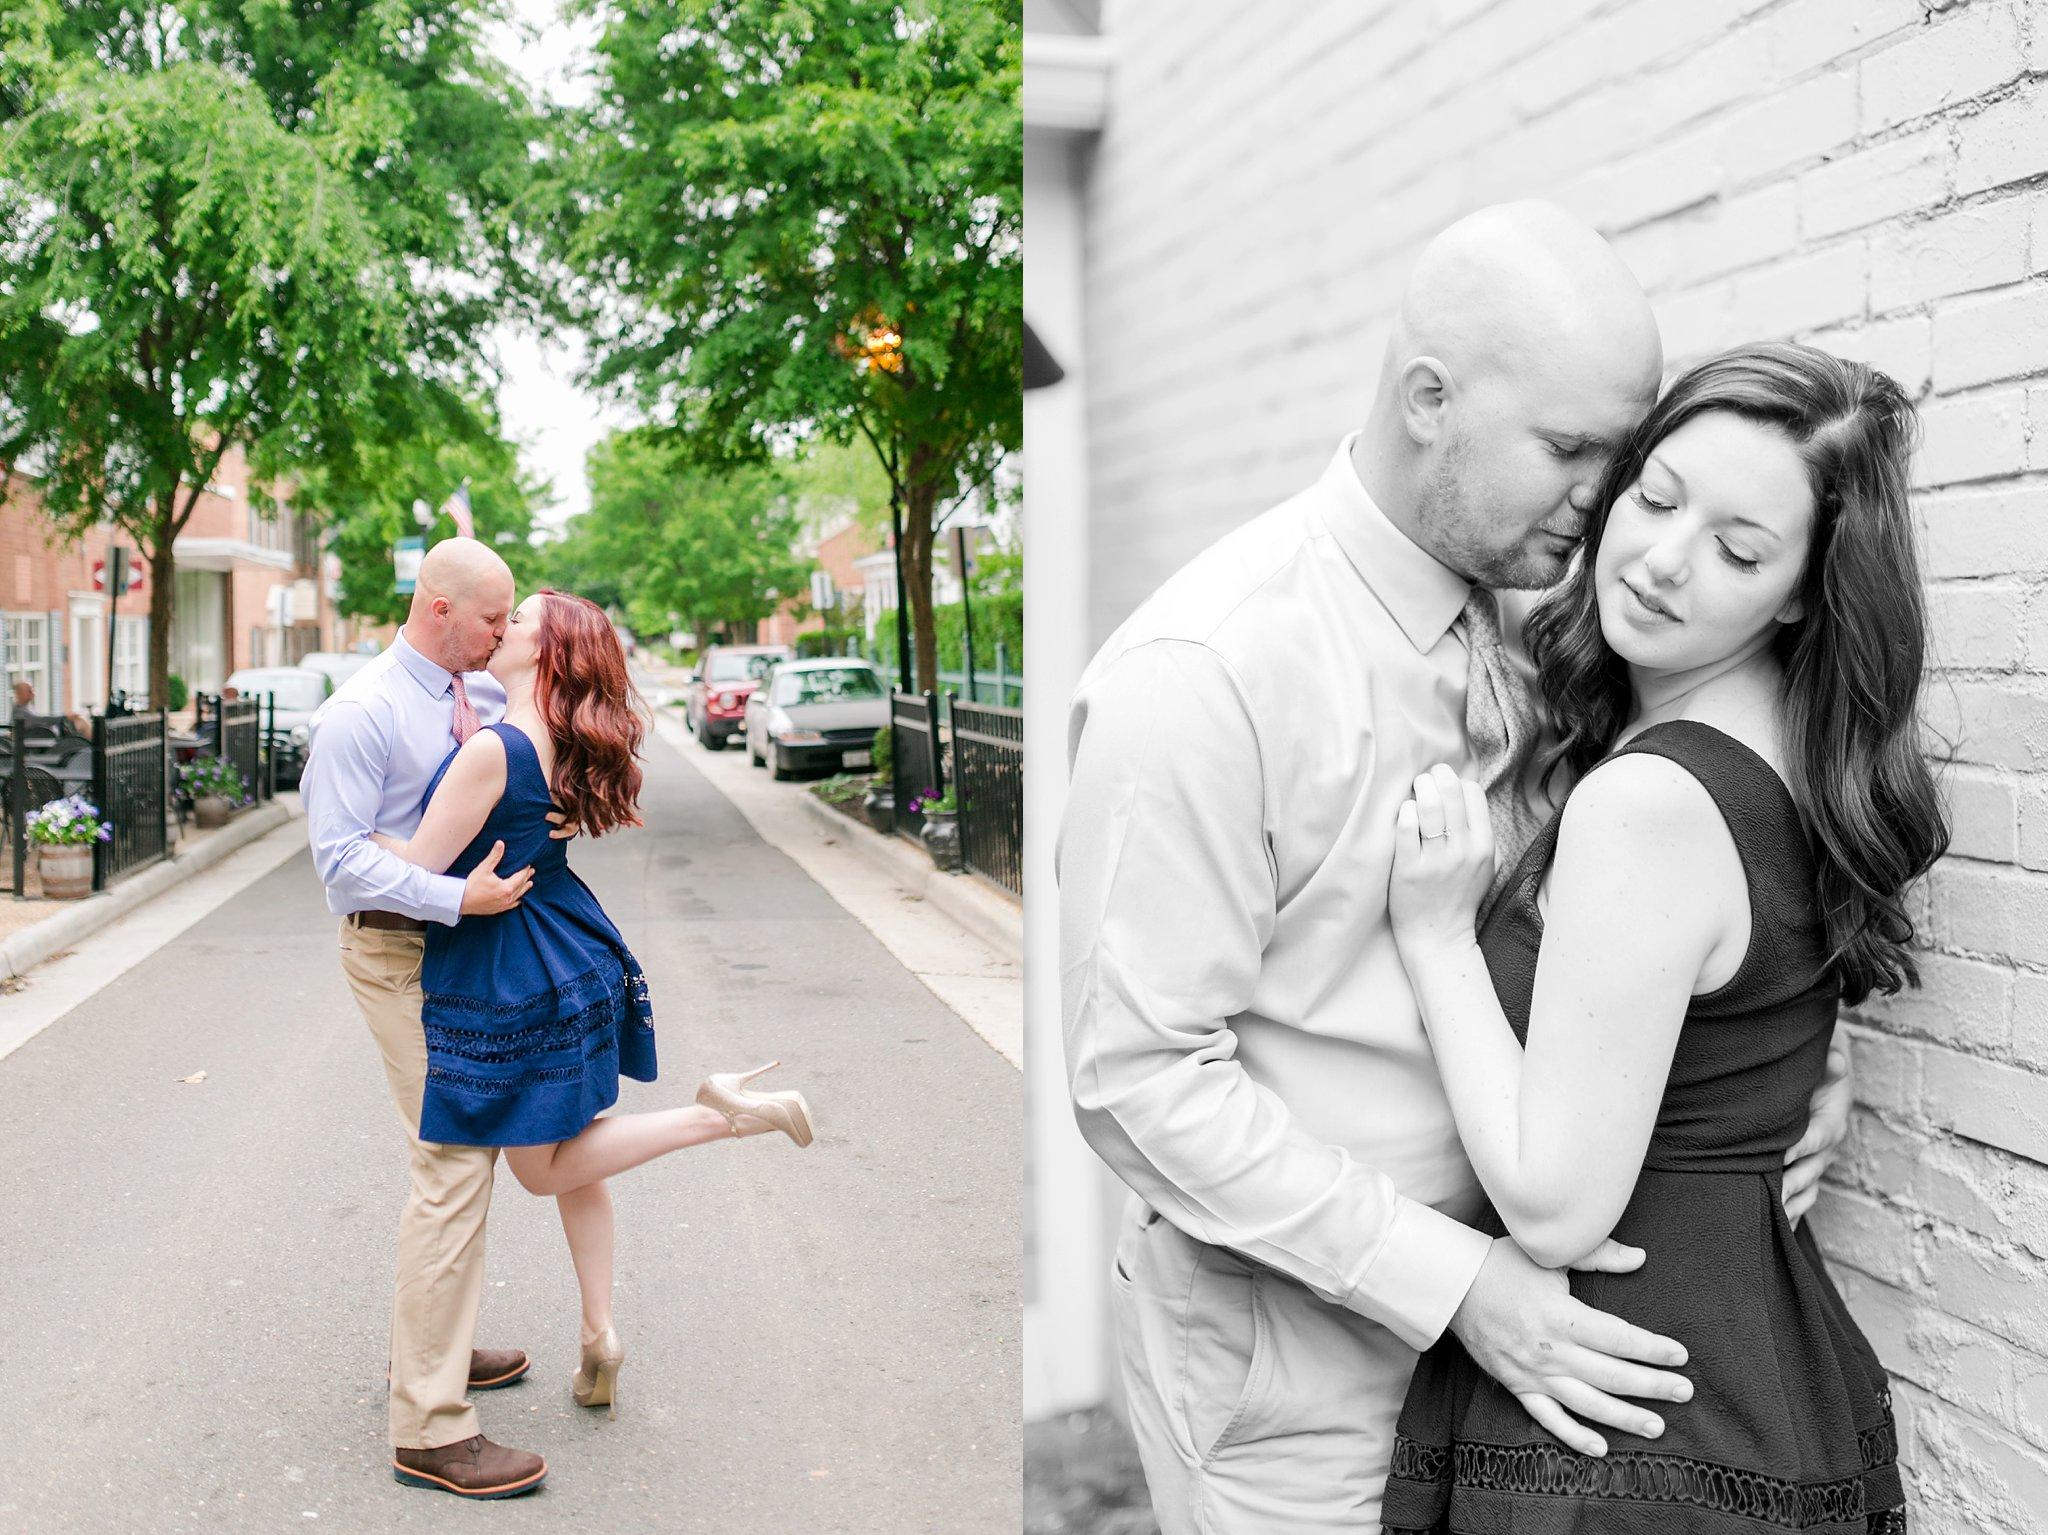 Old Town Manassas Battlefield Engagement Photos Virginia Wedding Photographer Jessica & Jason-73.jpg